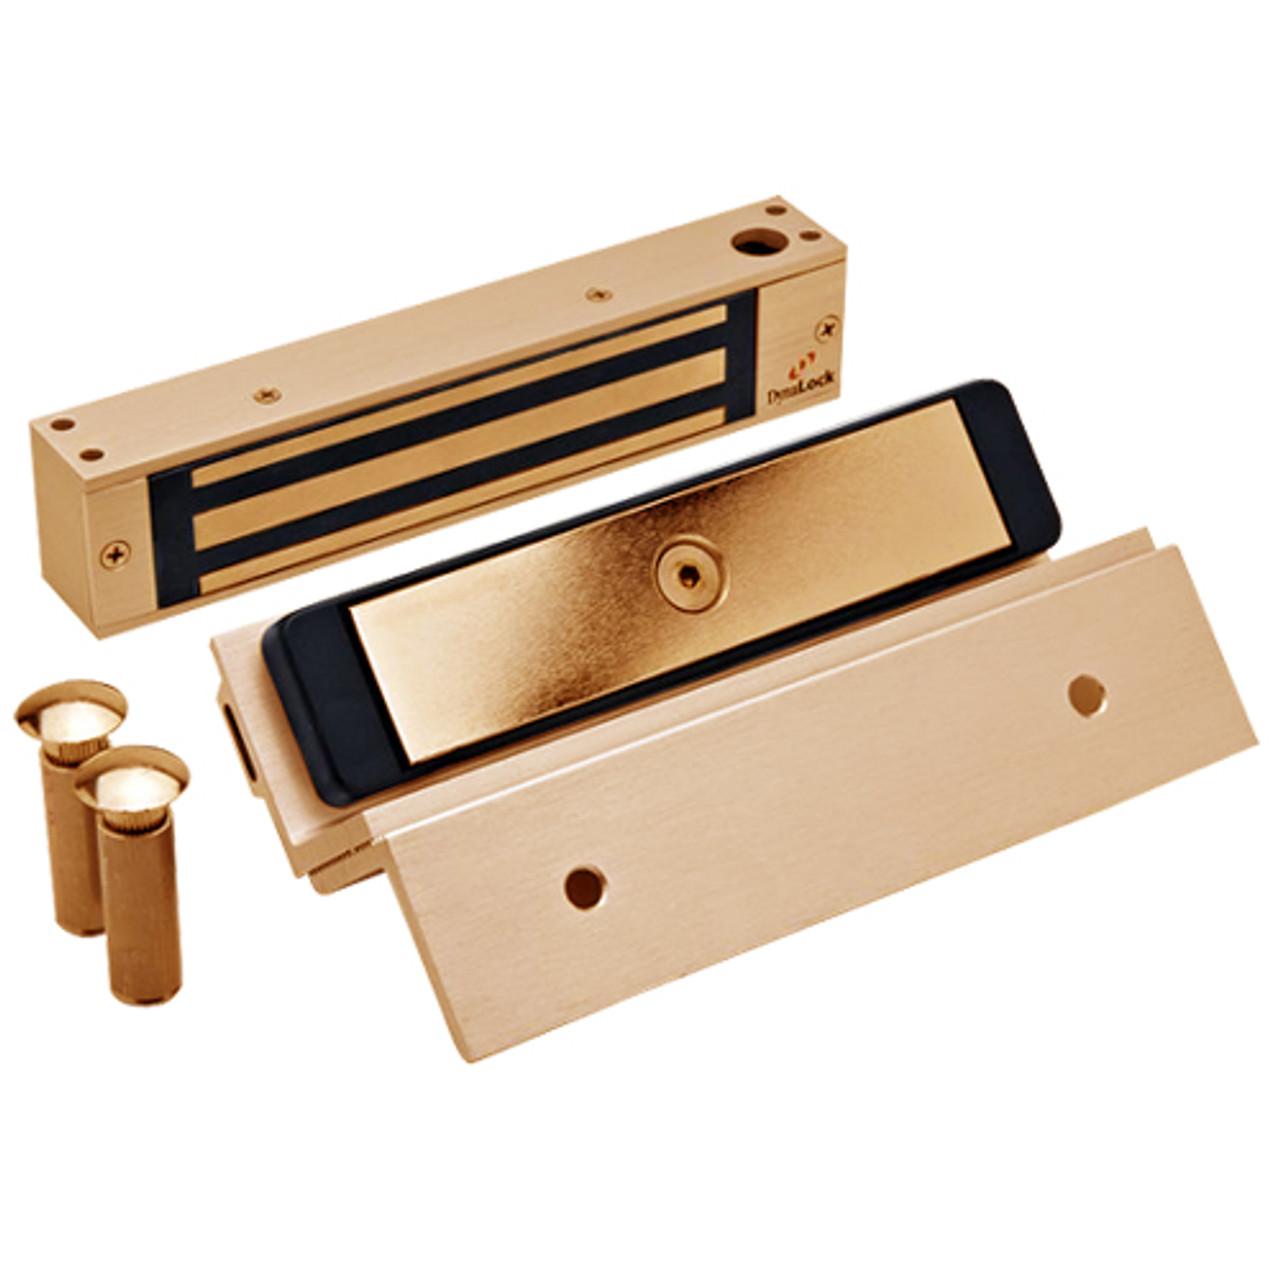 2585-TJ85-US10 DynaLock 2500 Series 650 LB Single Bantam Mini Electromagnetic Lock for Inswing Door in Satin Bronze